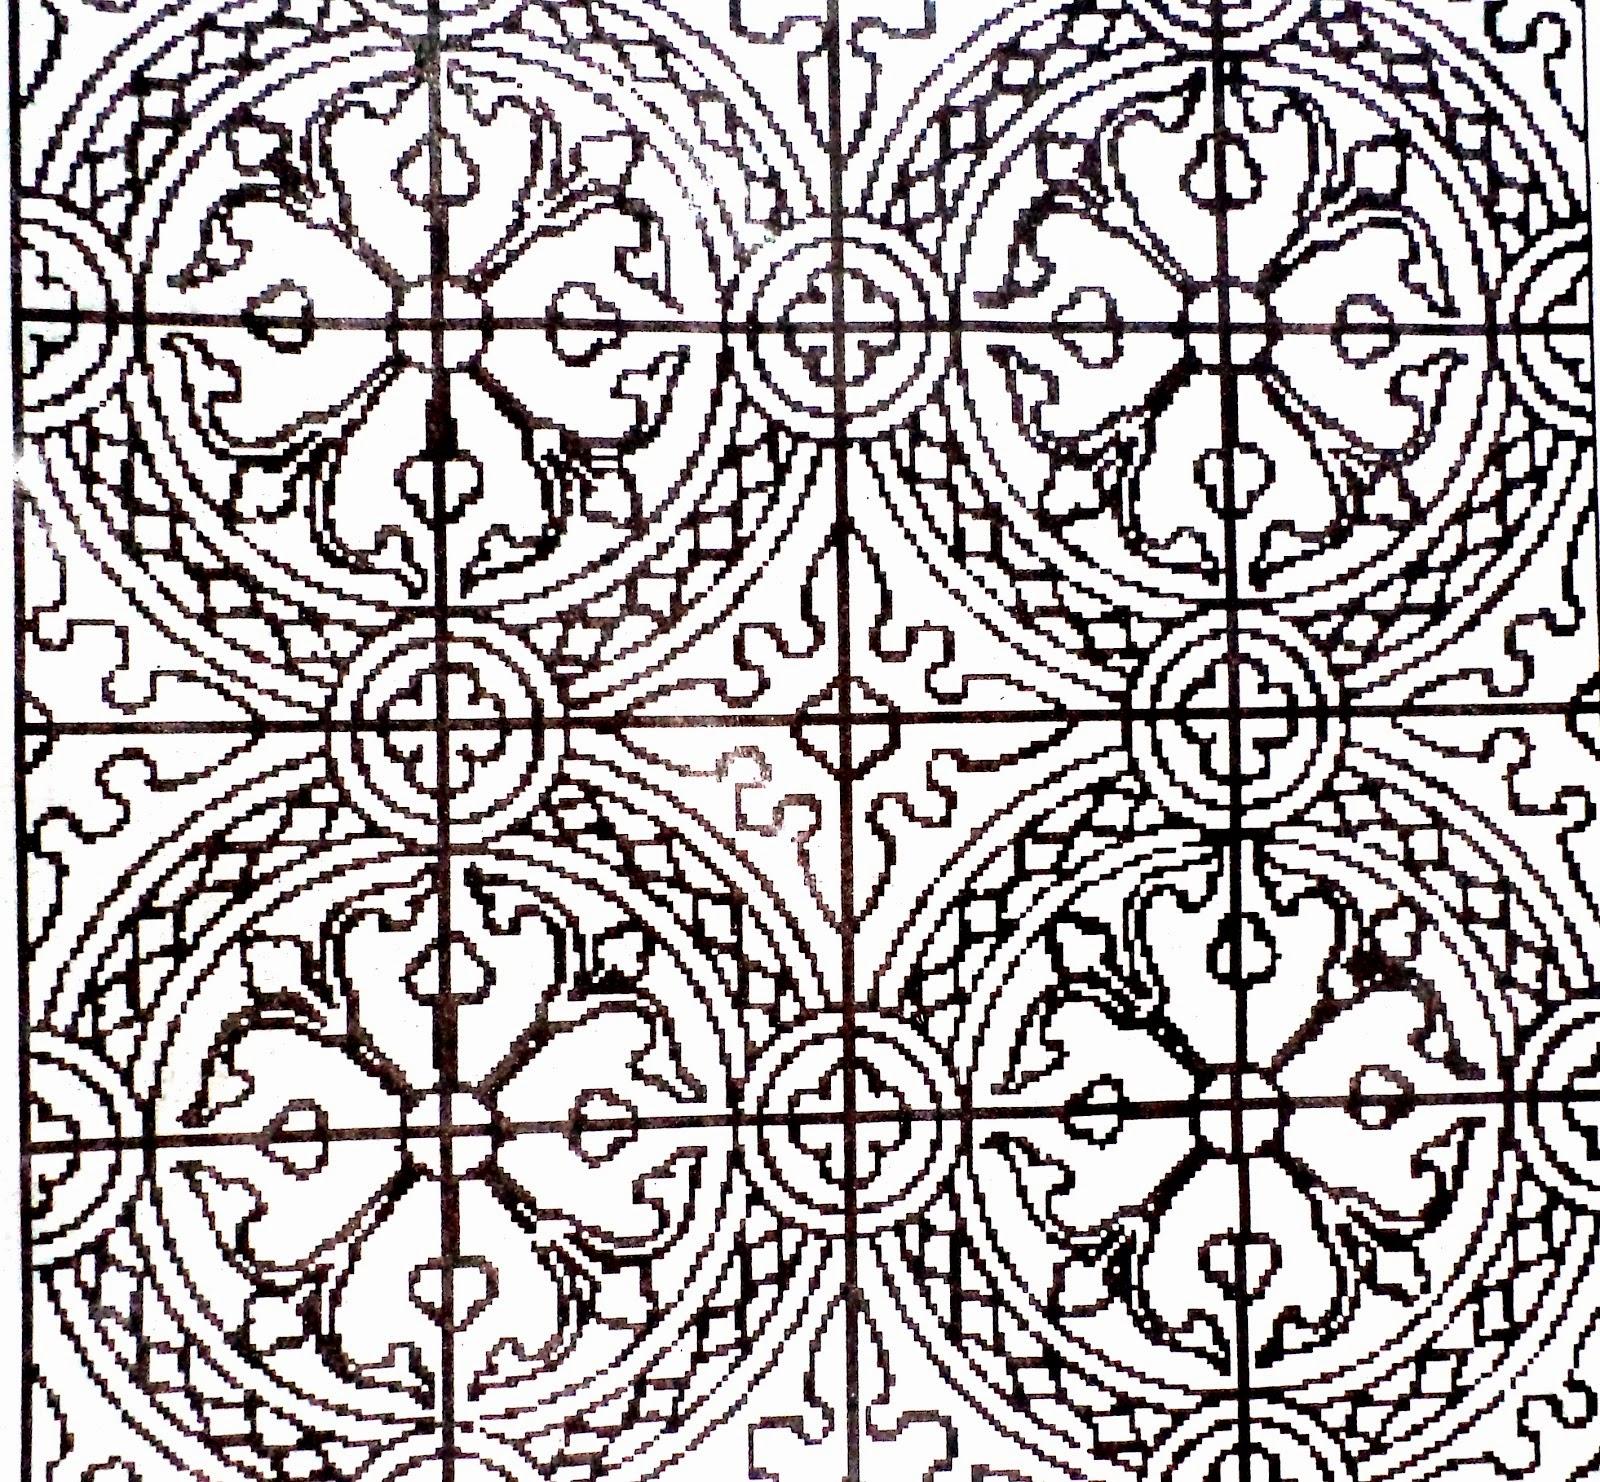 Menggambar Ragam Hias Geometris